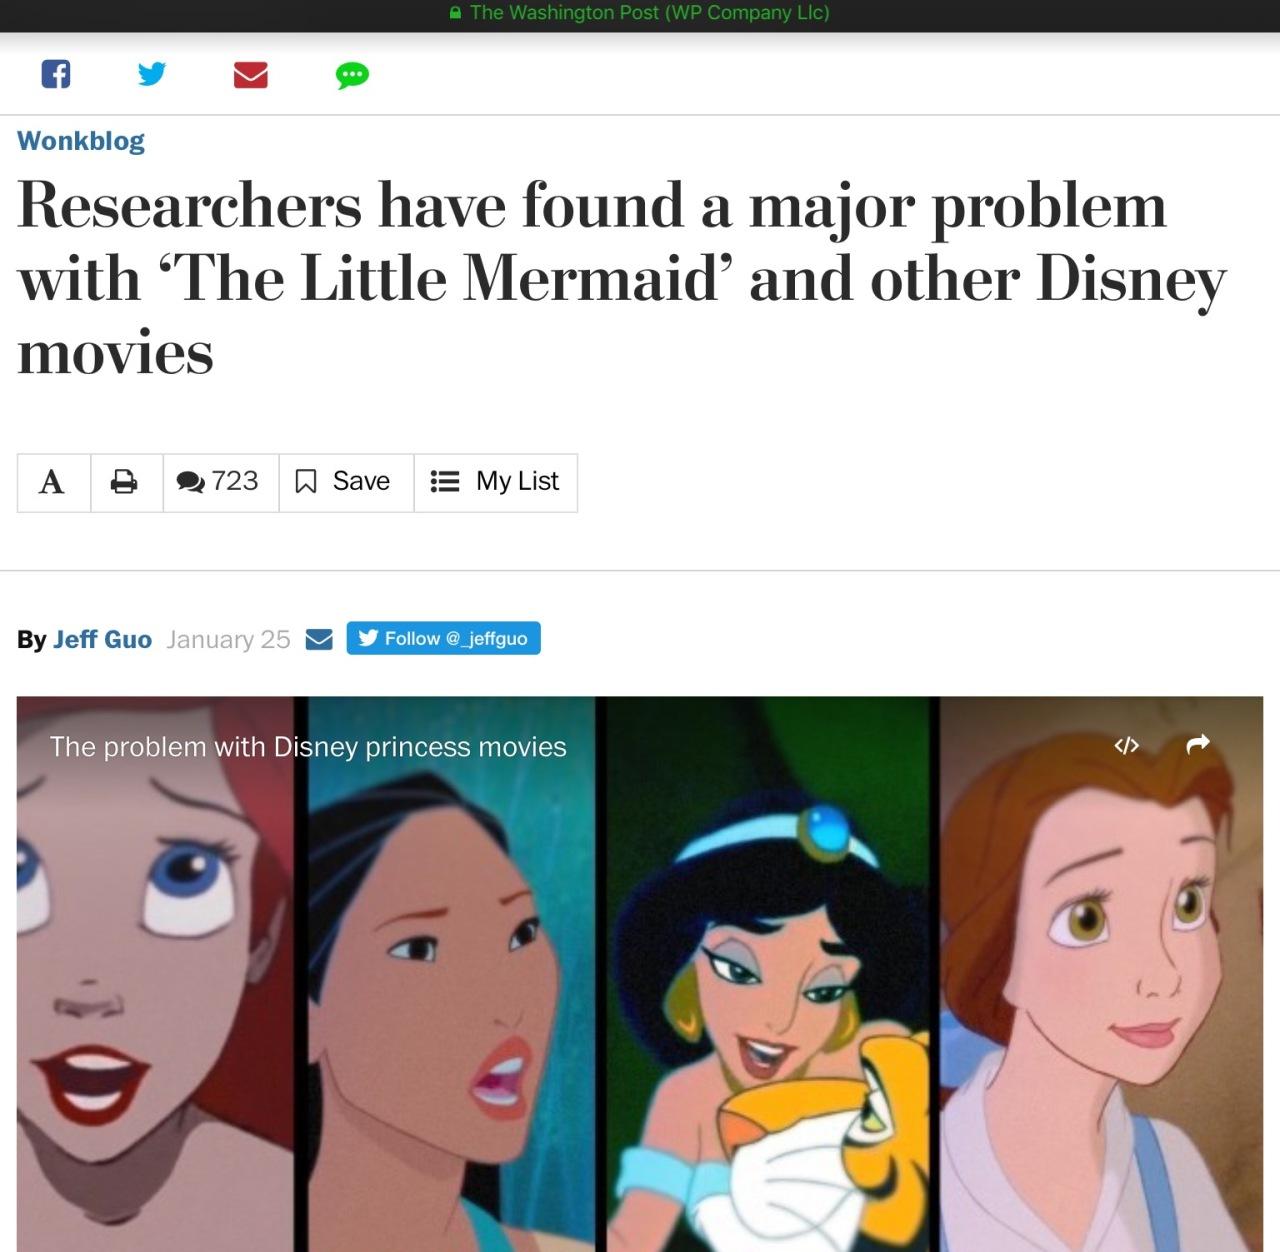 Screen capture of the Washington Post.